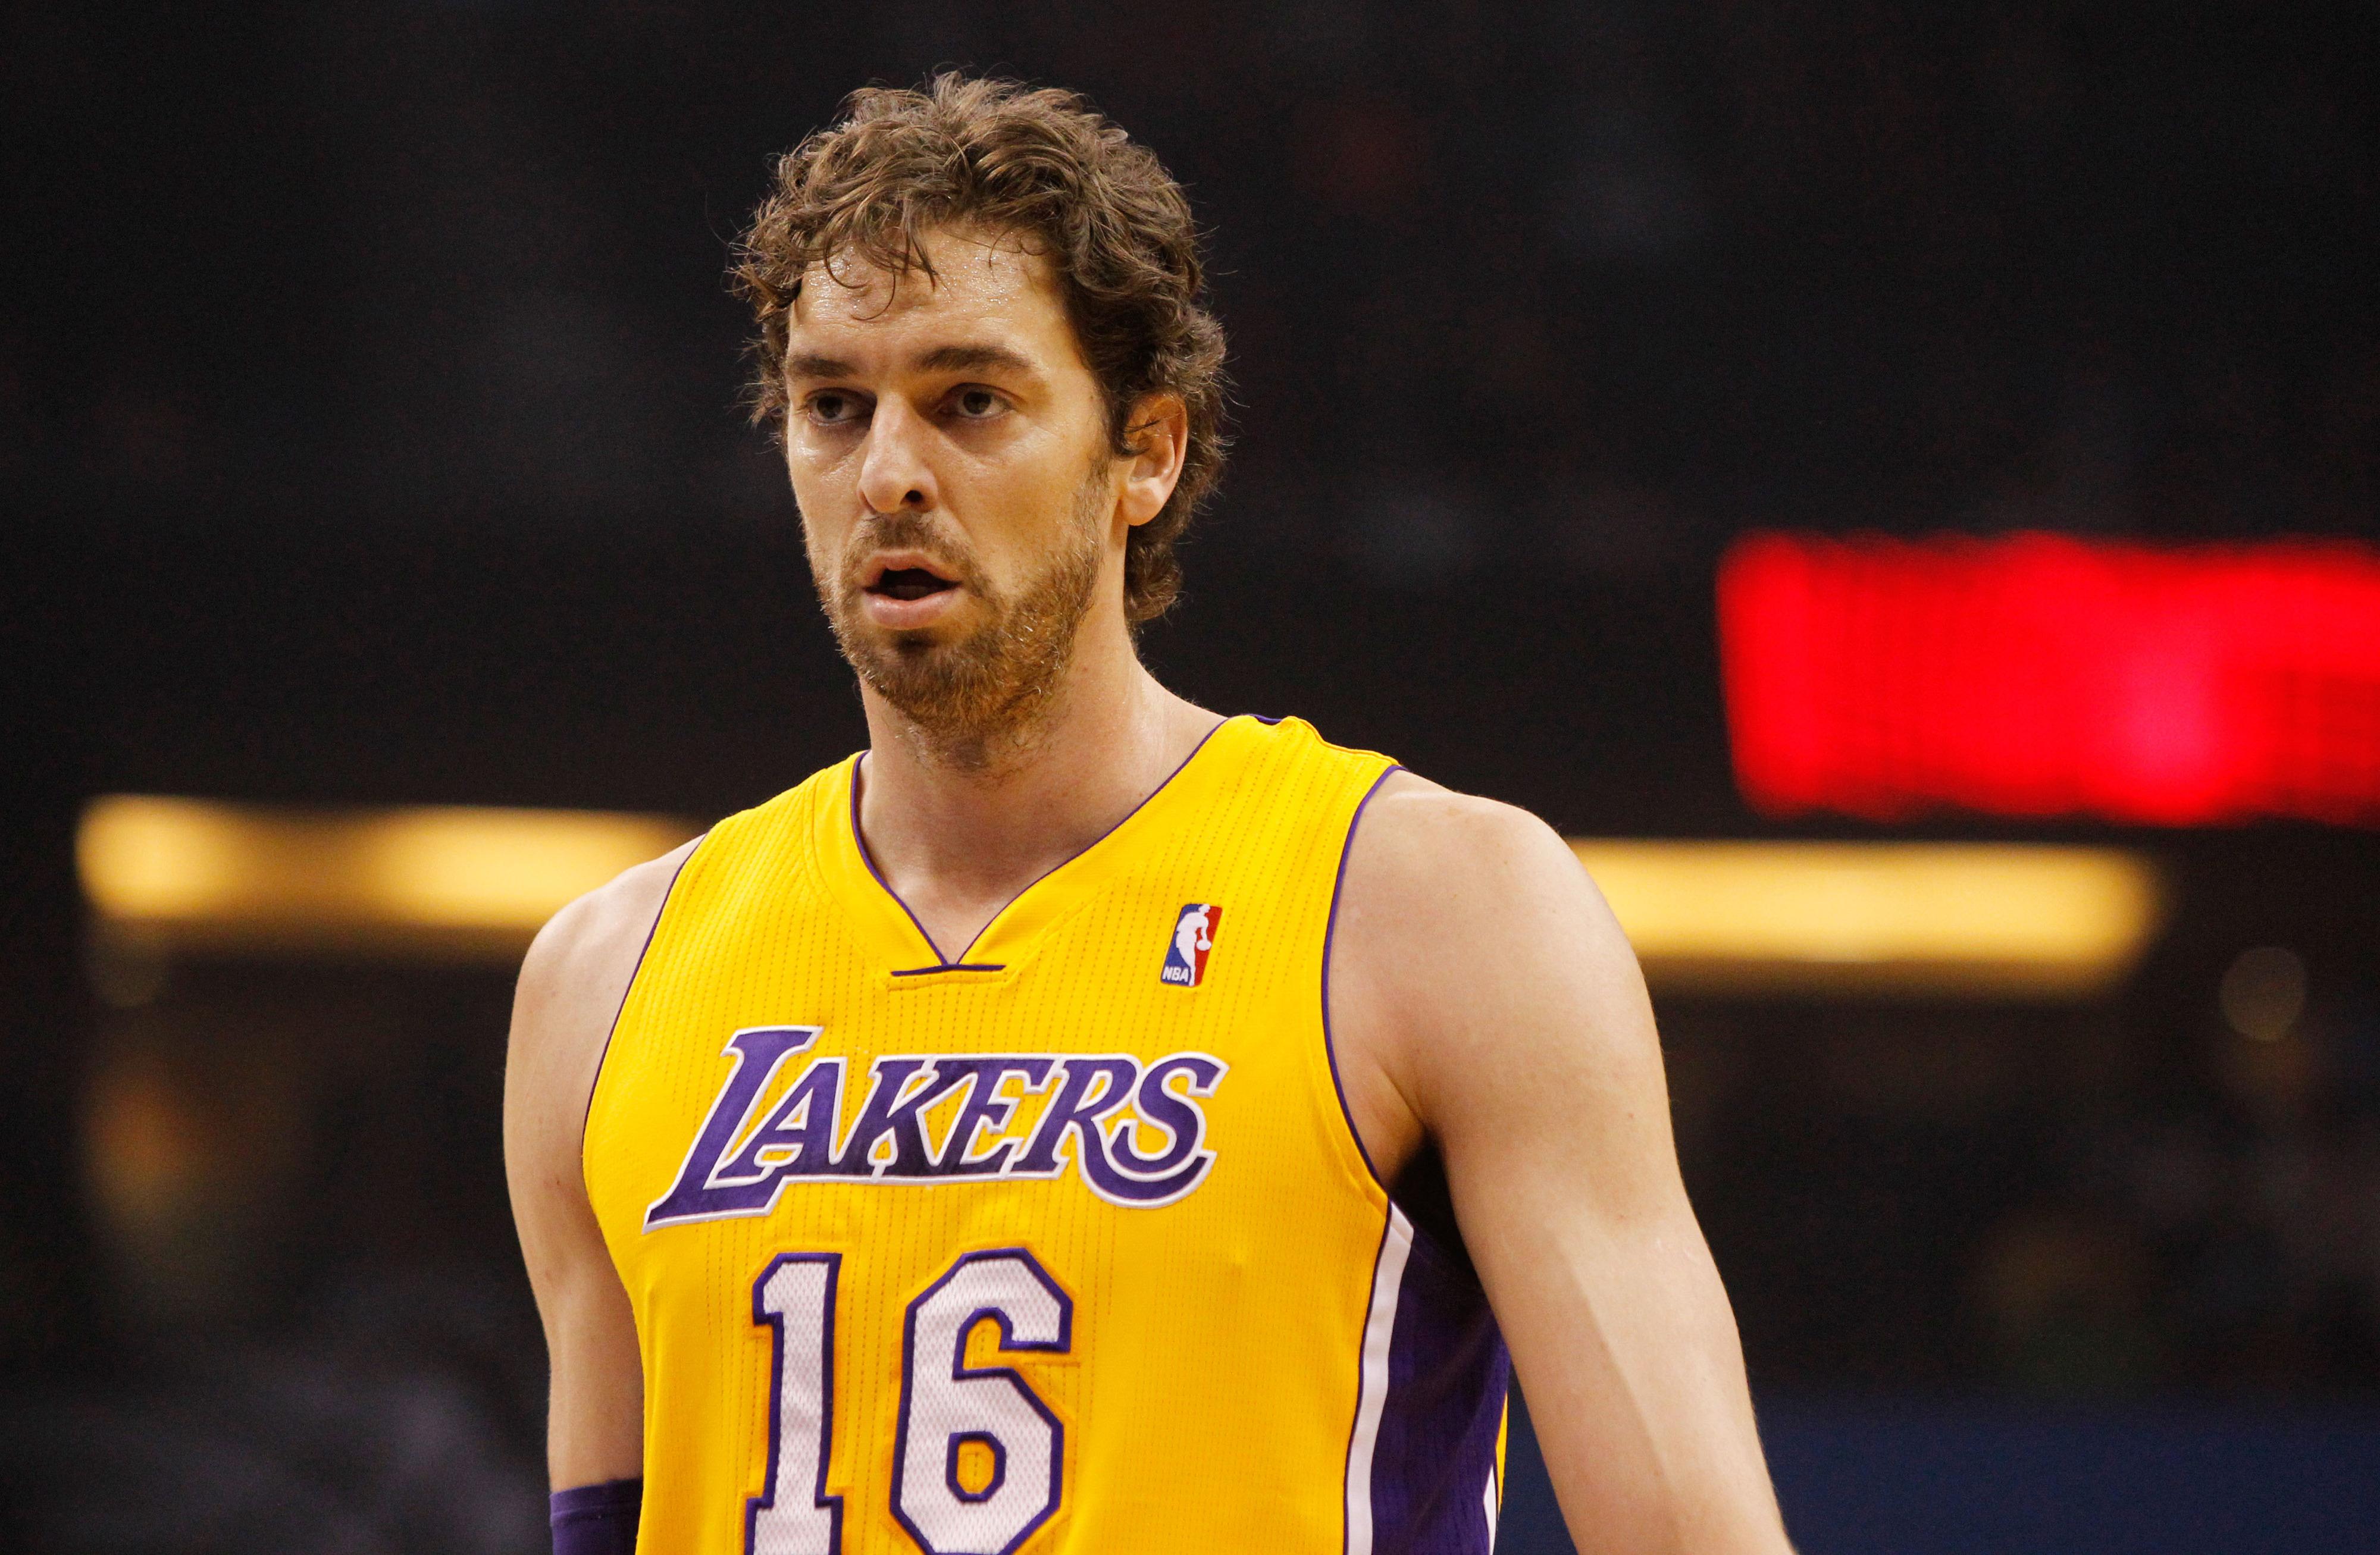 NBA trade rumors roundup: Lakers weighing benefits of keeping Pau Gasol, Nets-Kings discussions progressing